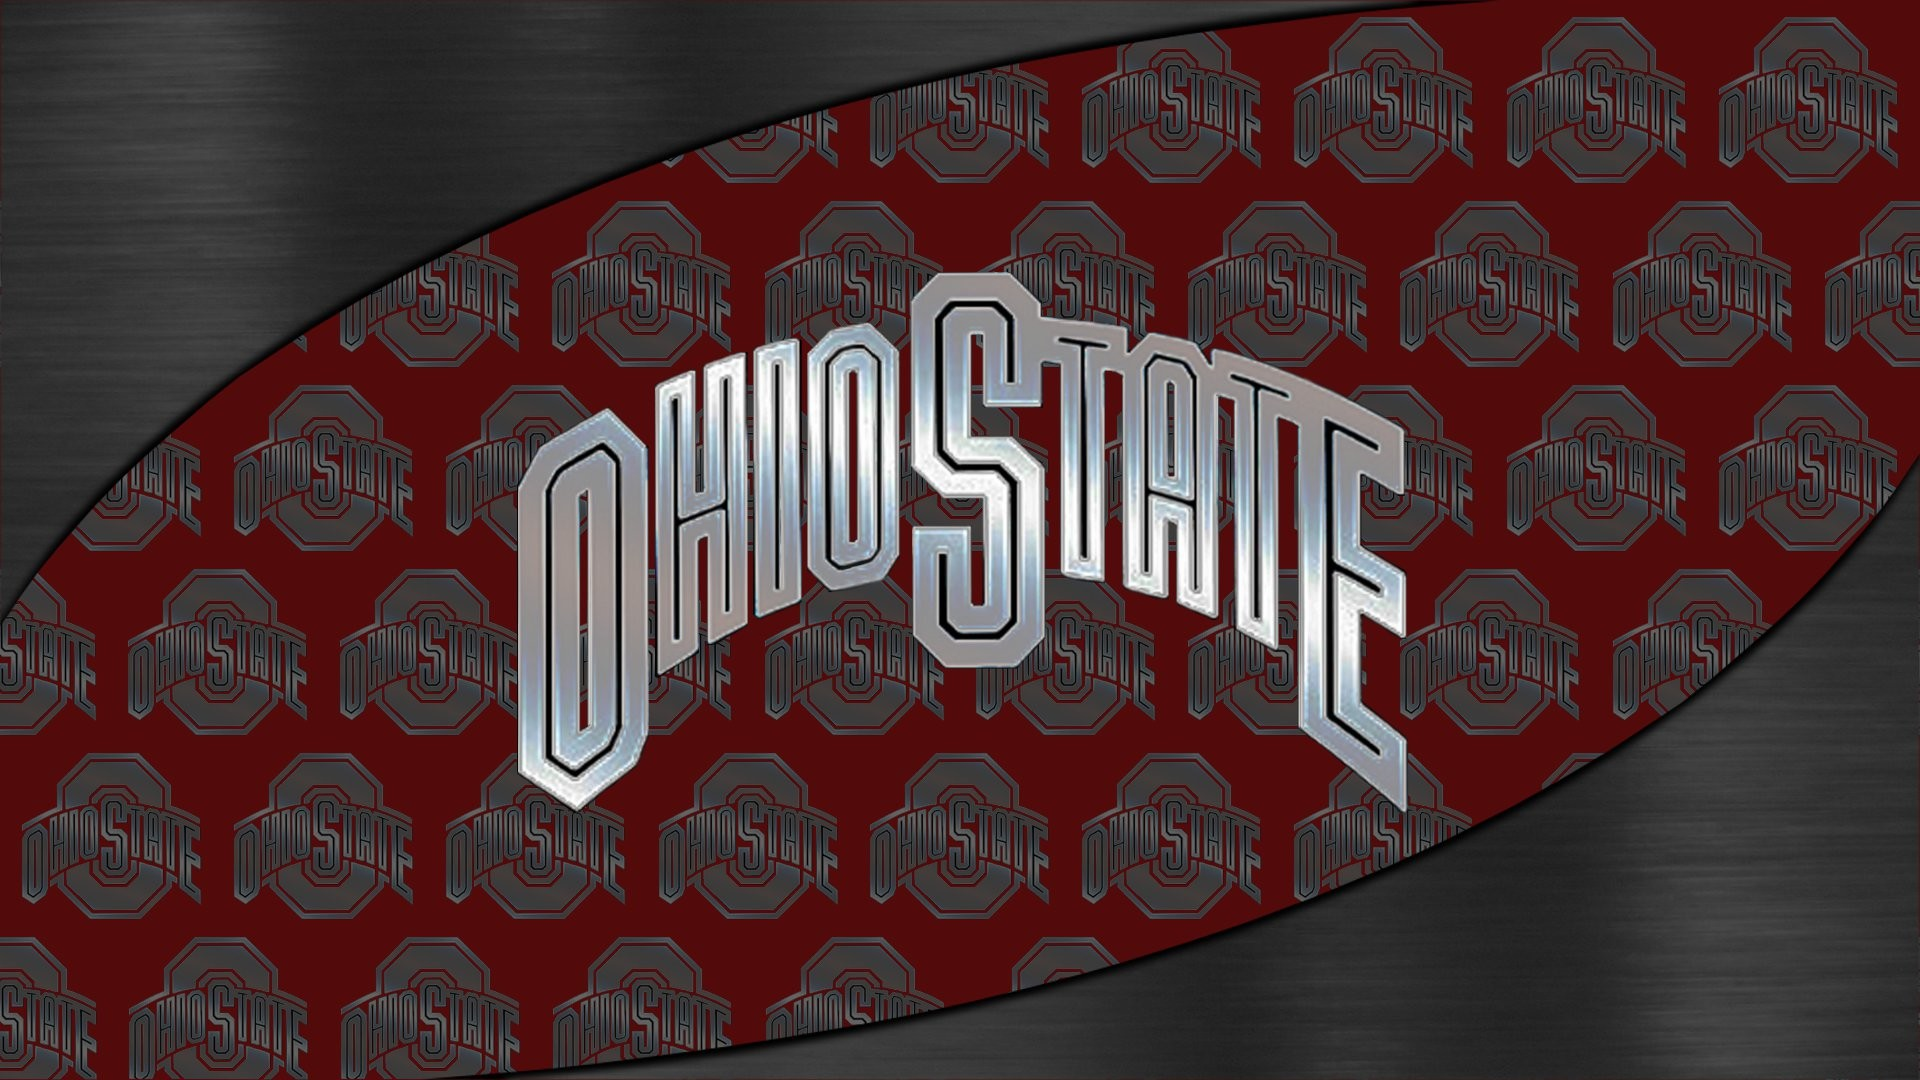 OSU Wallpaper 97 | OHIO STATE DESKTOP WALLPAPERS | Pinterest